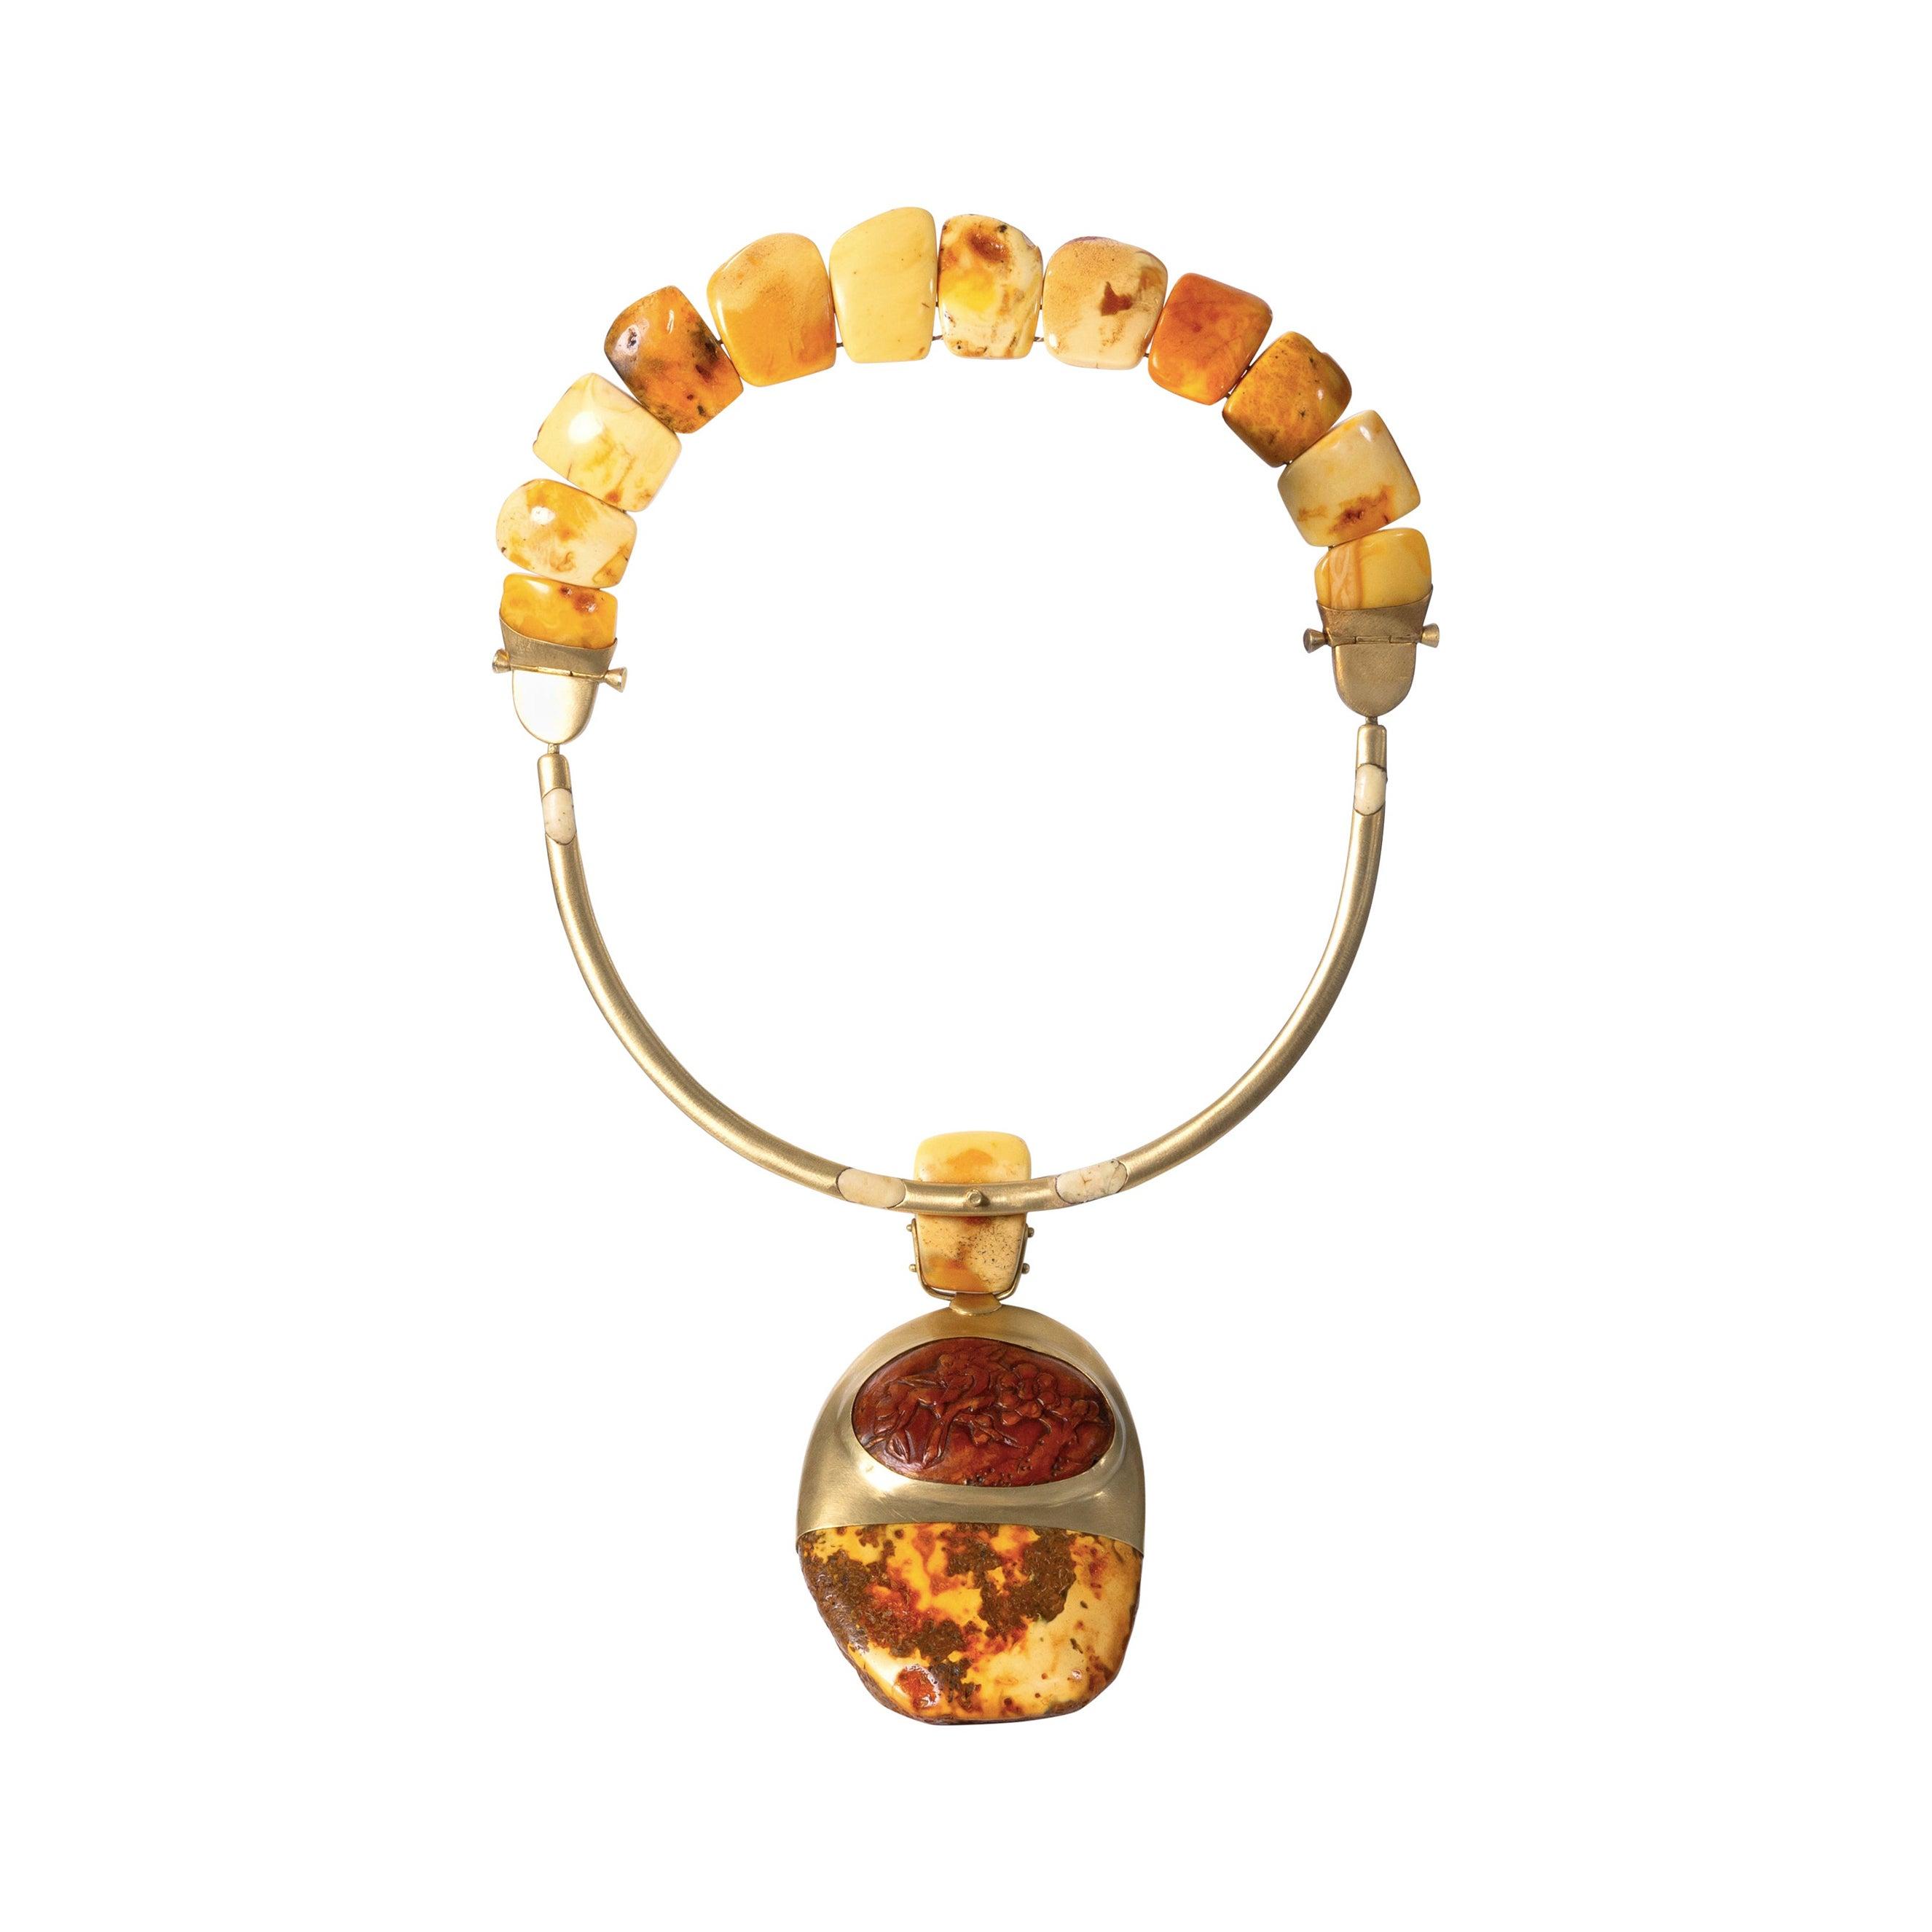 22 Karat Gold, Latvian White Amber and Baltic Amber Pendant Necklace